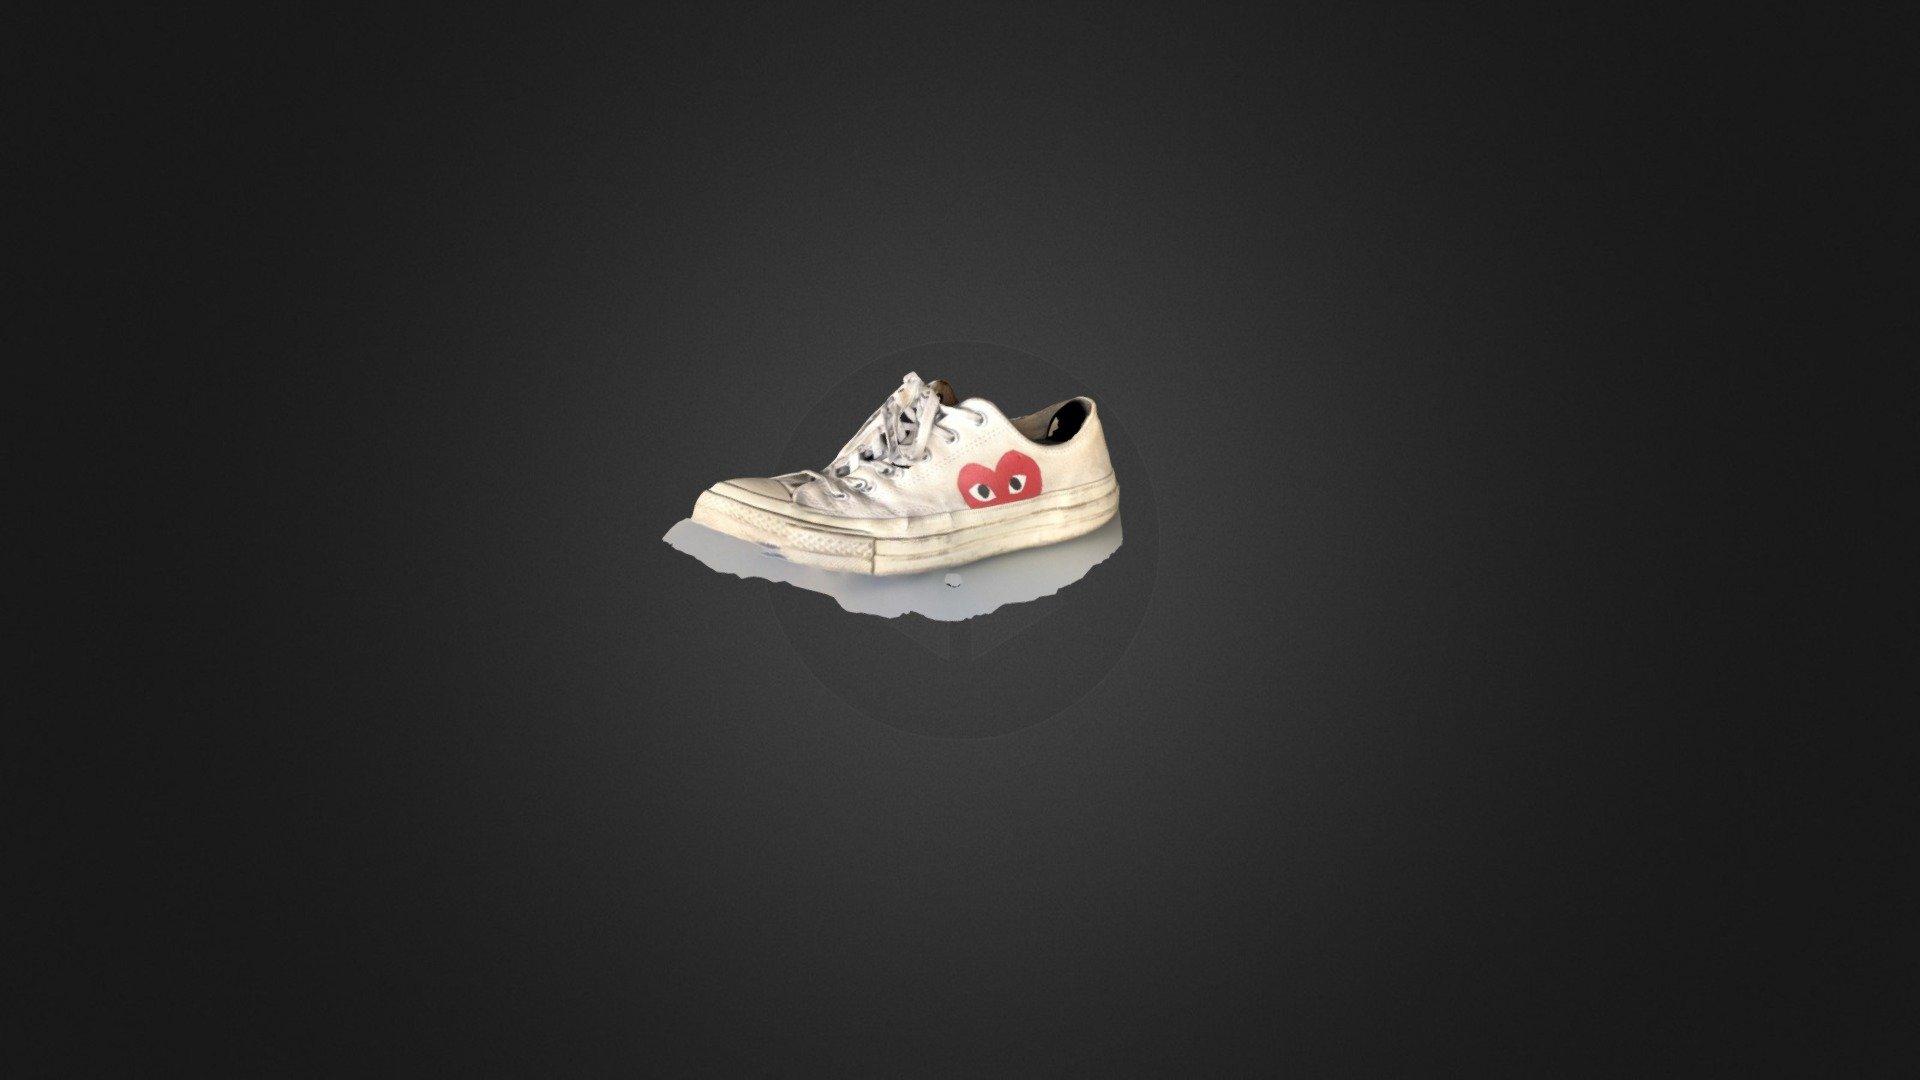 Shoe Comme Des Garçons 3d Model By Sarah At Sarah 4b4adaf